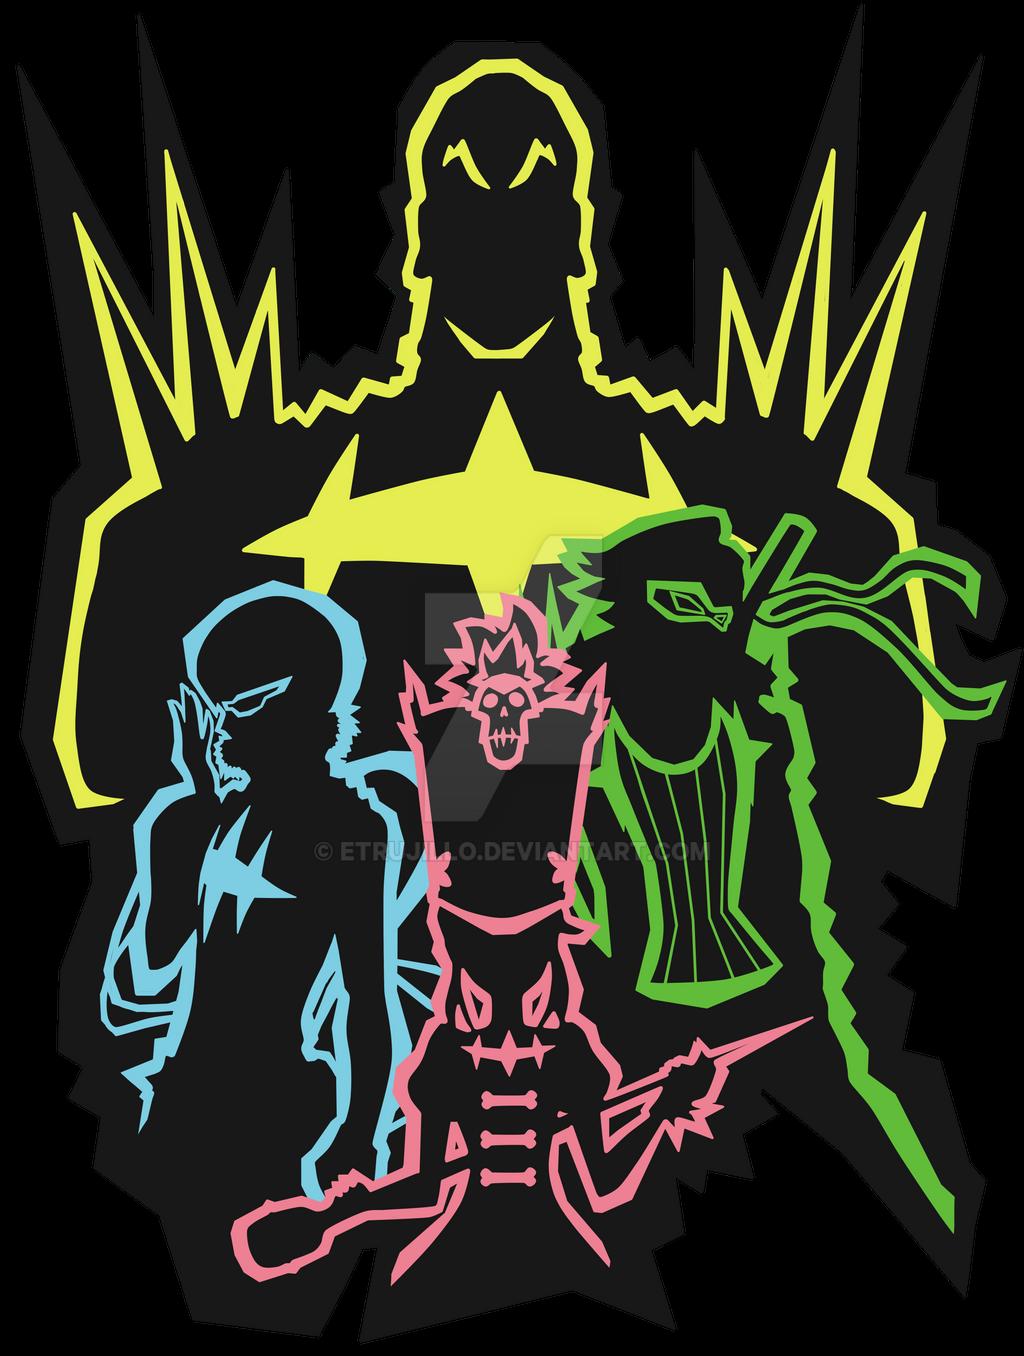 Shirt design wallpaper -  Elite Four Kill La Kill T Shirt Design By Etrujillo